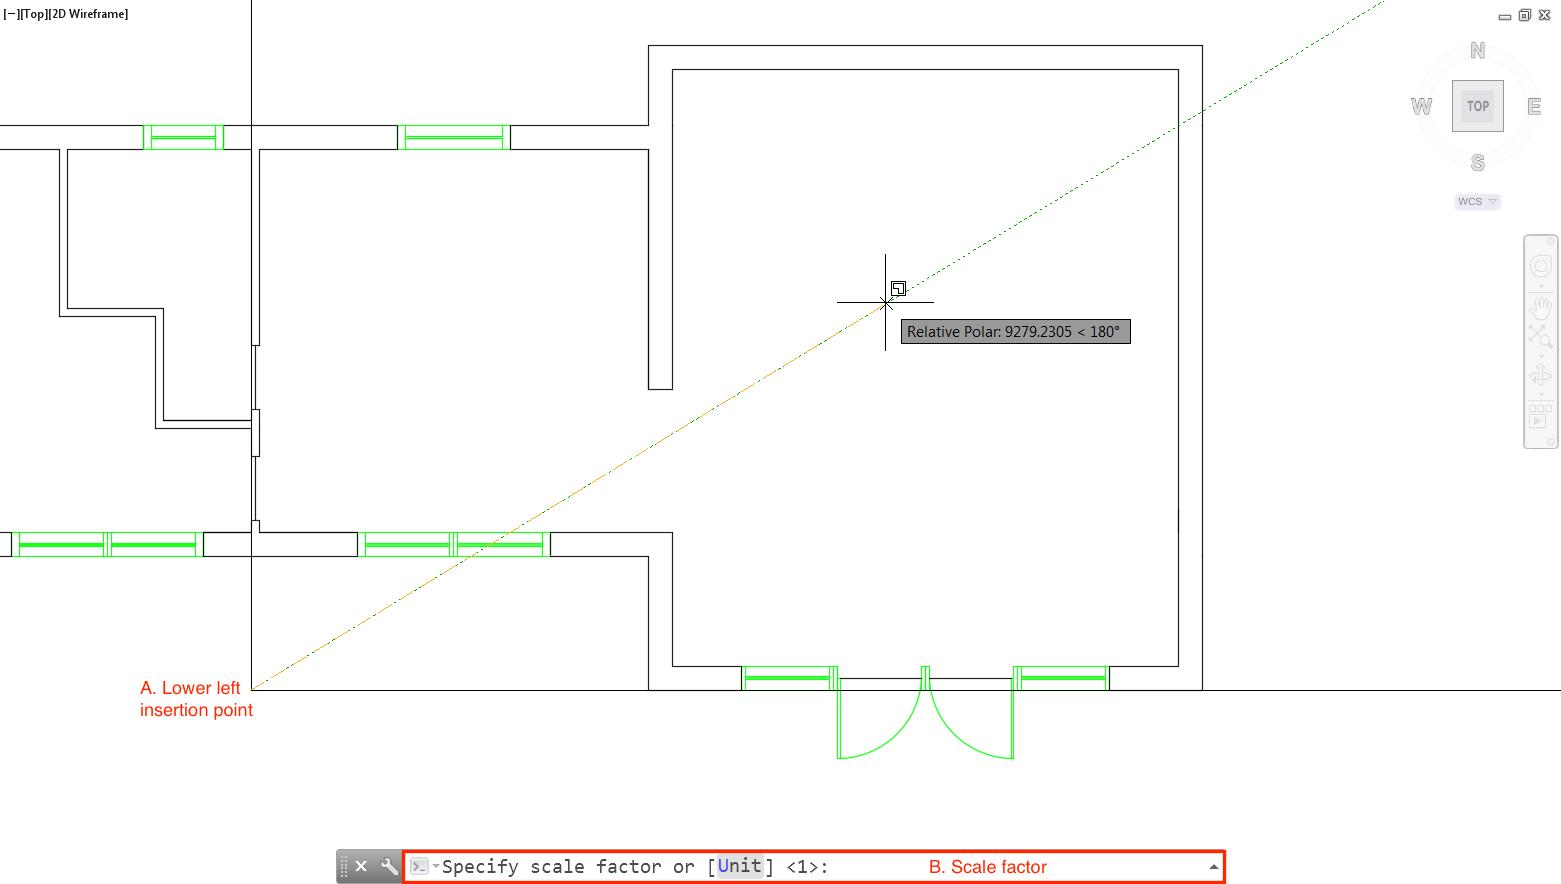 AutoCAD Training Article - Ch 4 - Screenshot 26